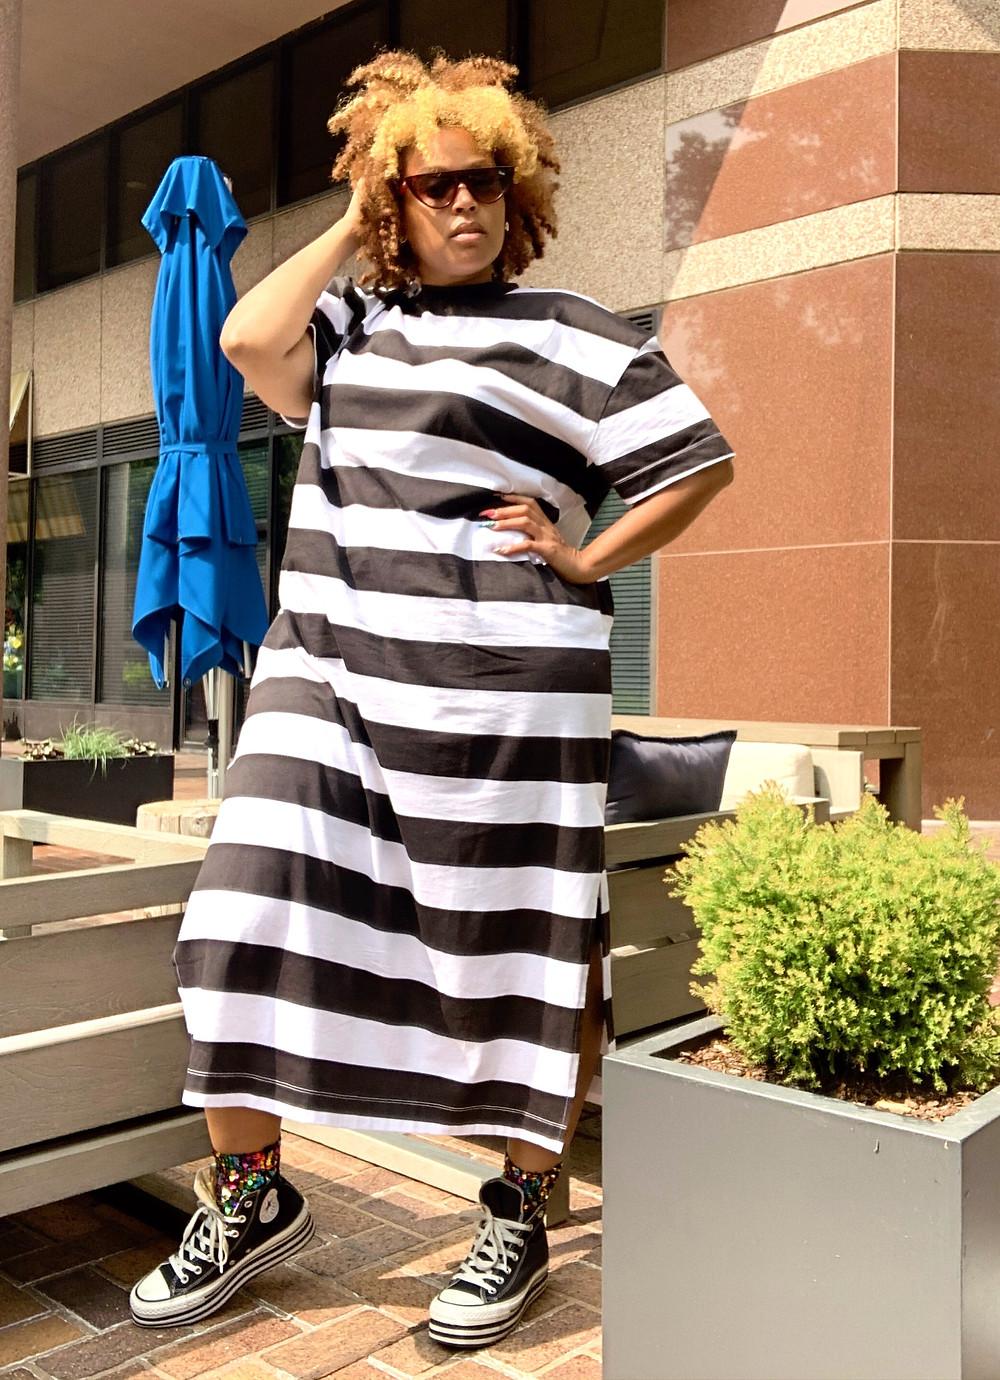 Jail stripes couture from ASOS along sequin socks, Platform Converse #chucks